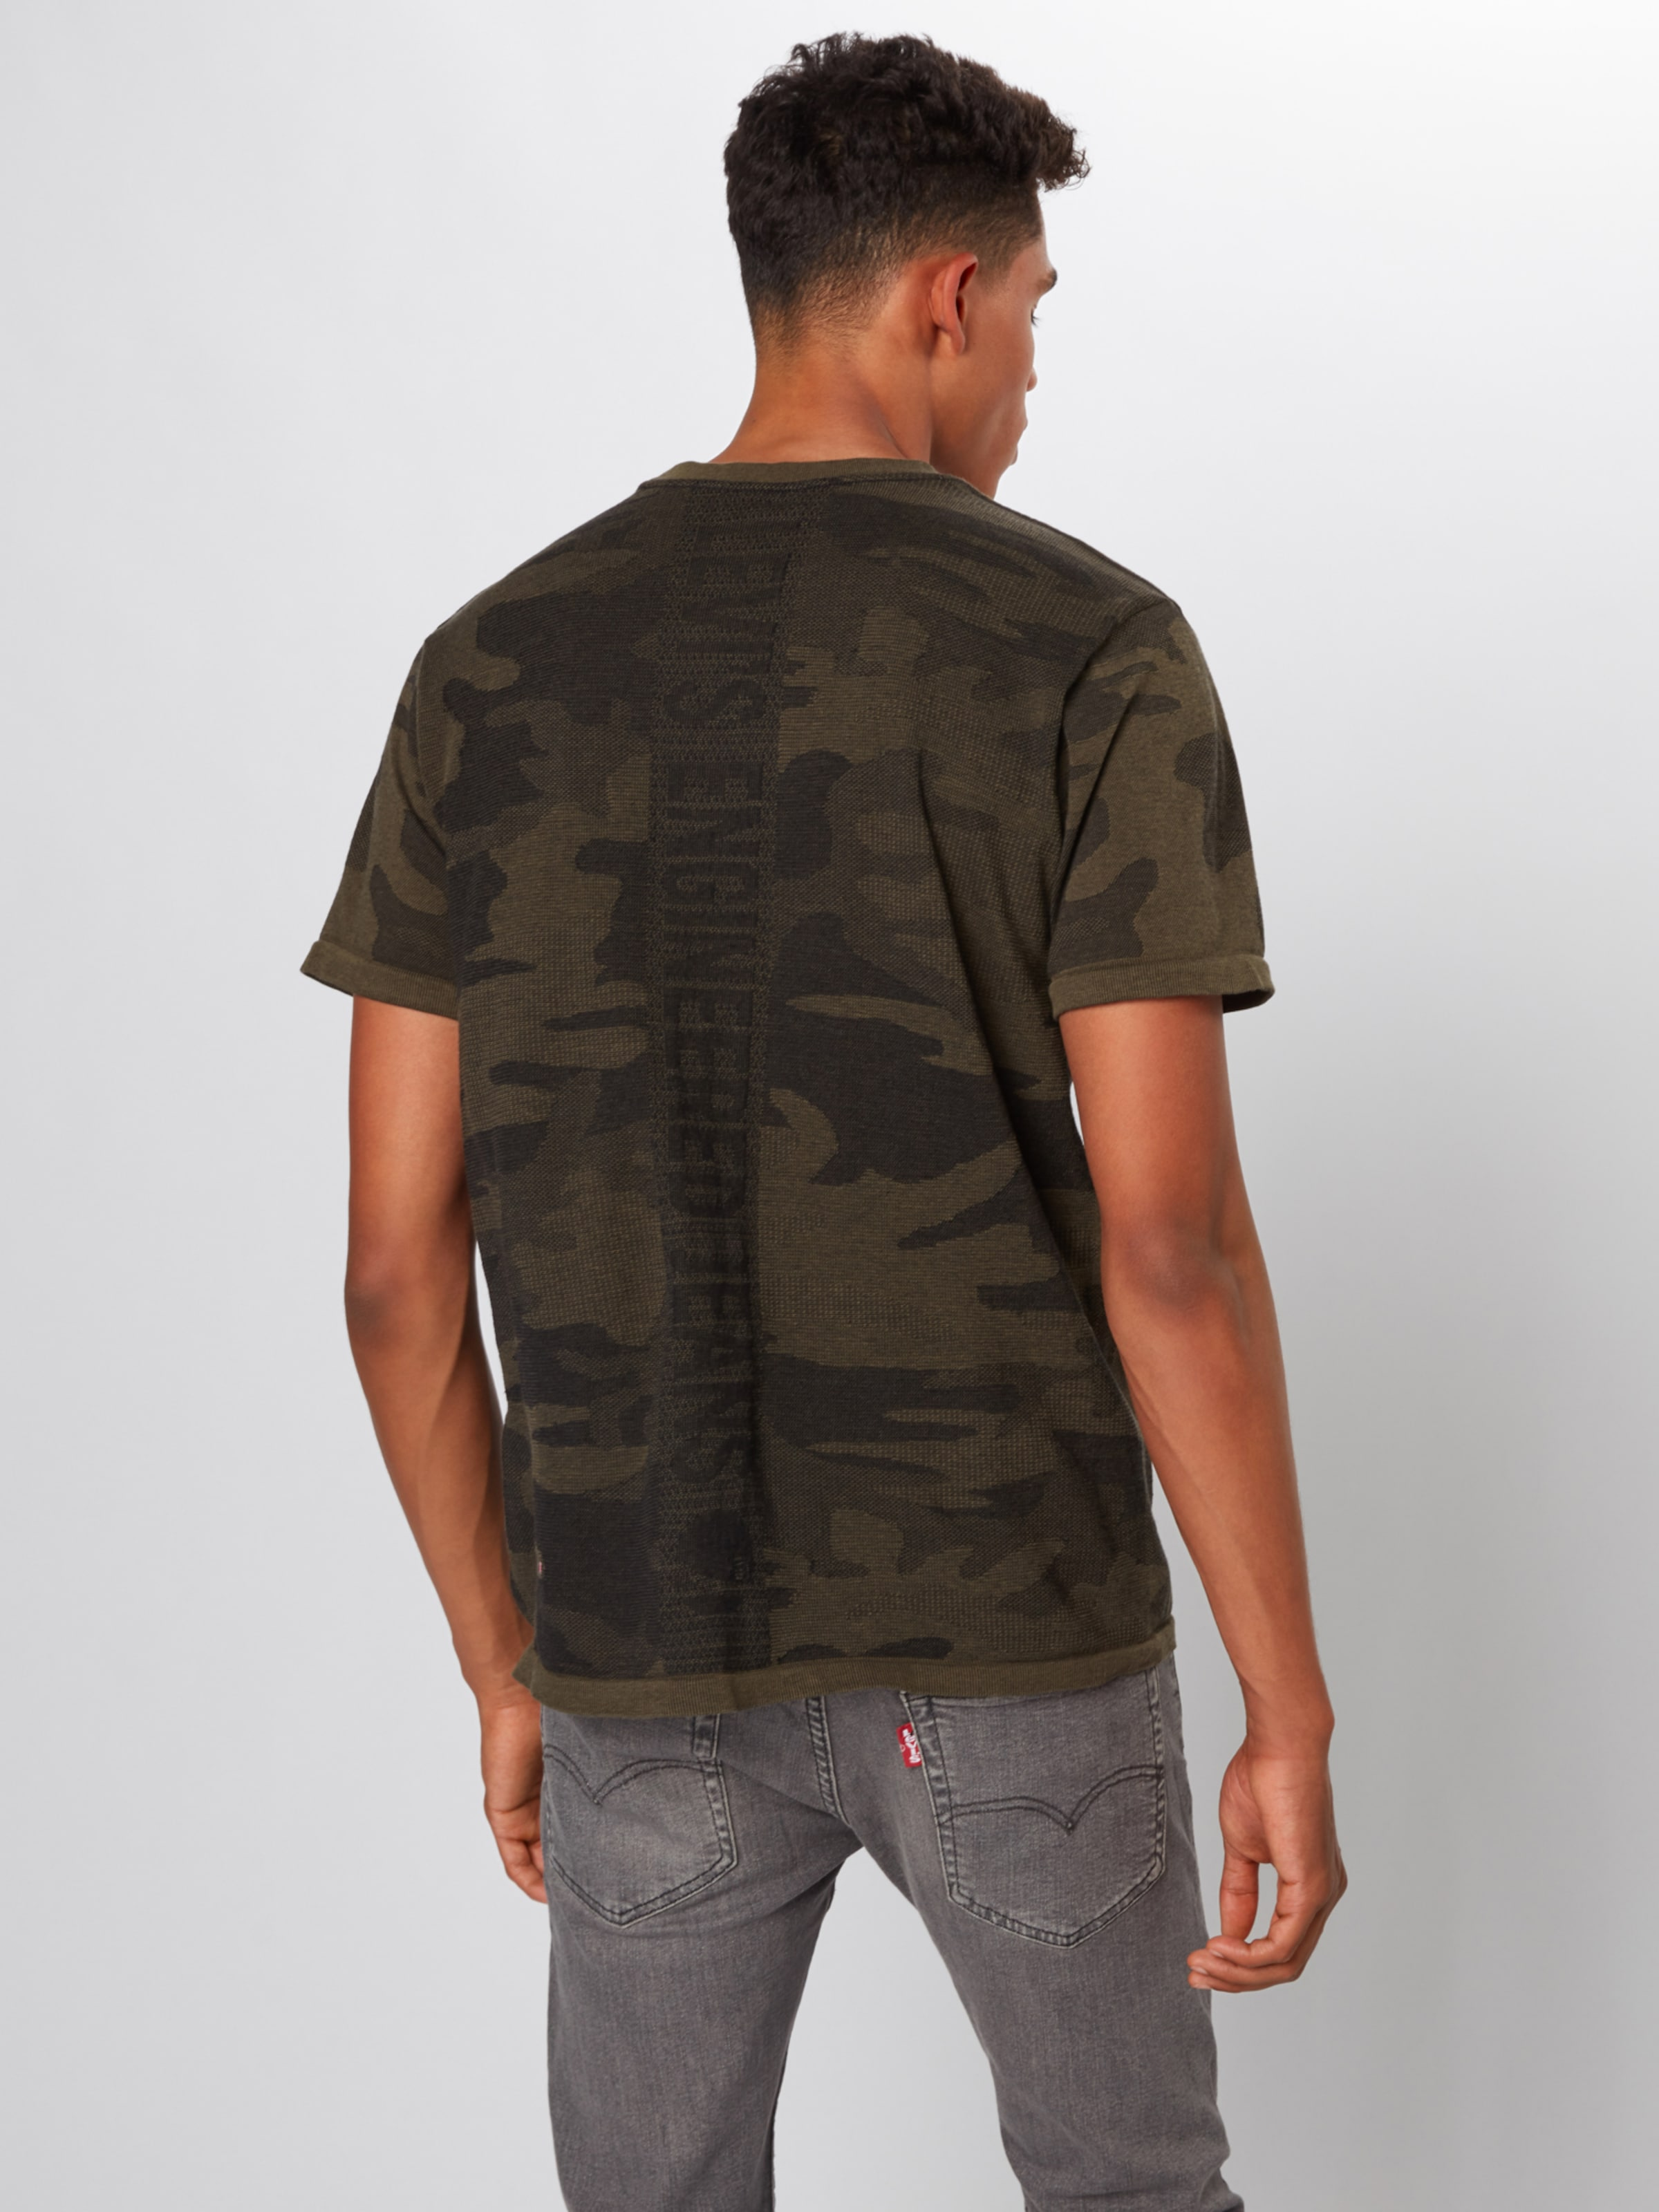 'lekteelek' Foncé Vert Levi's T shirt En nN0wv8m